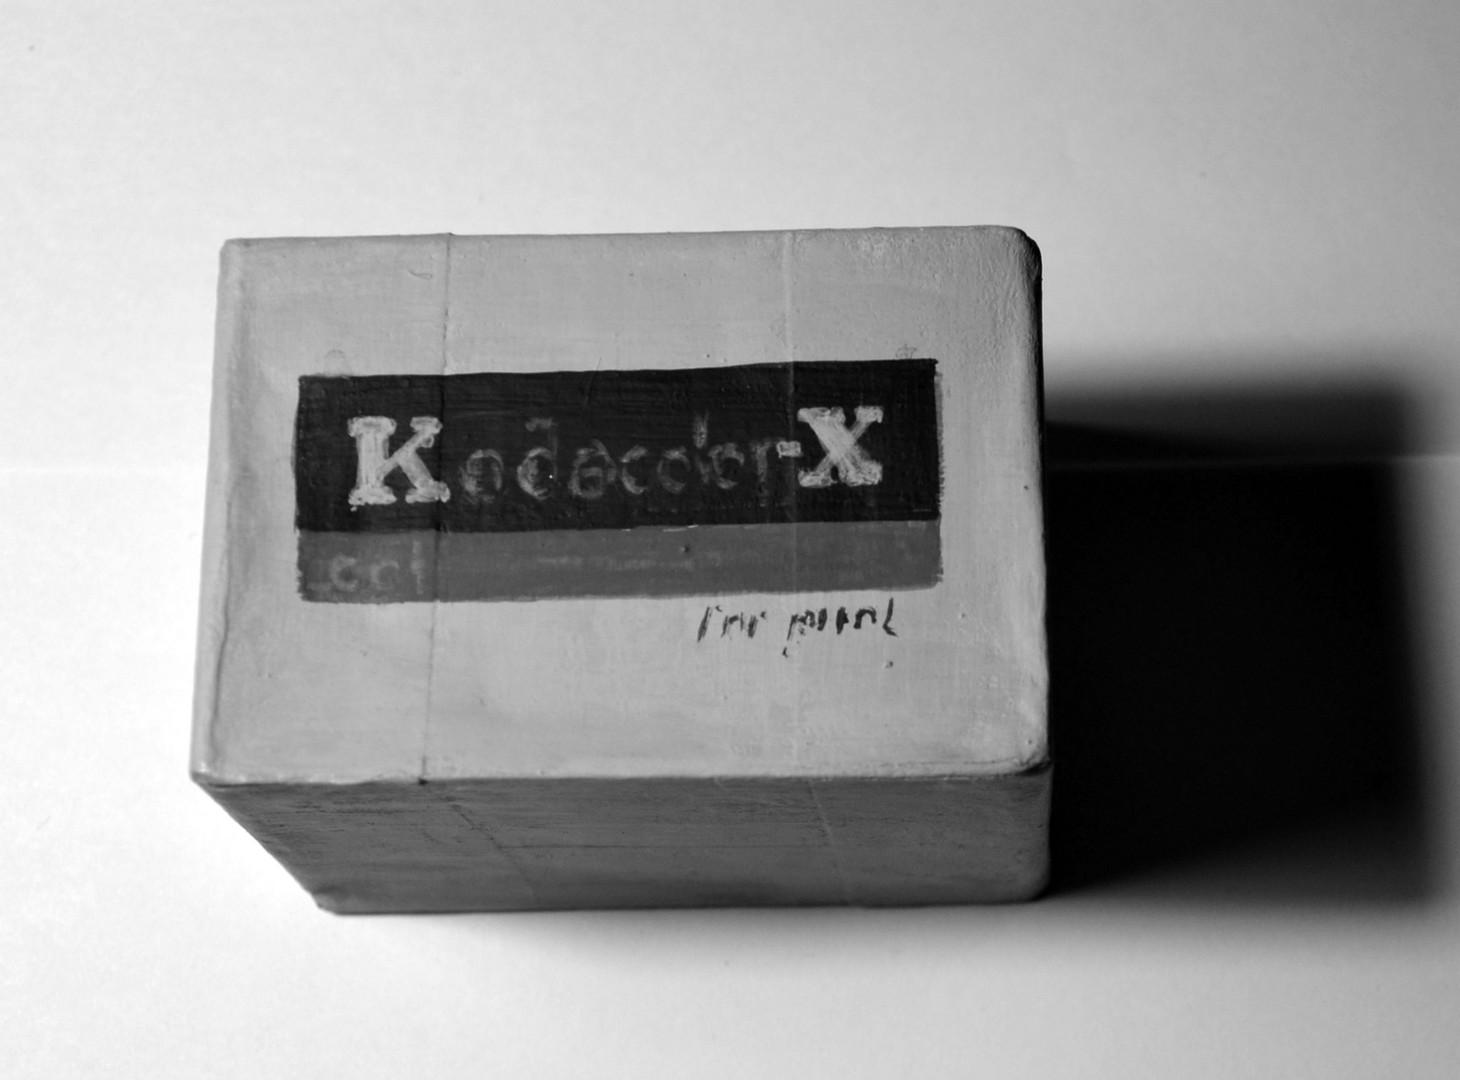 KodakX